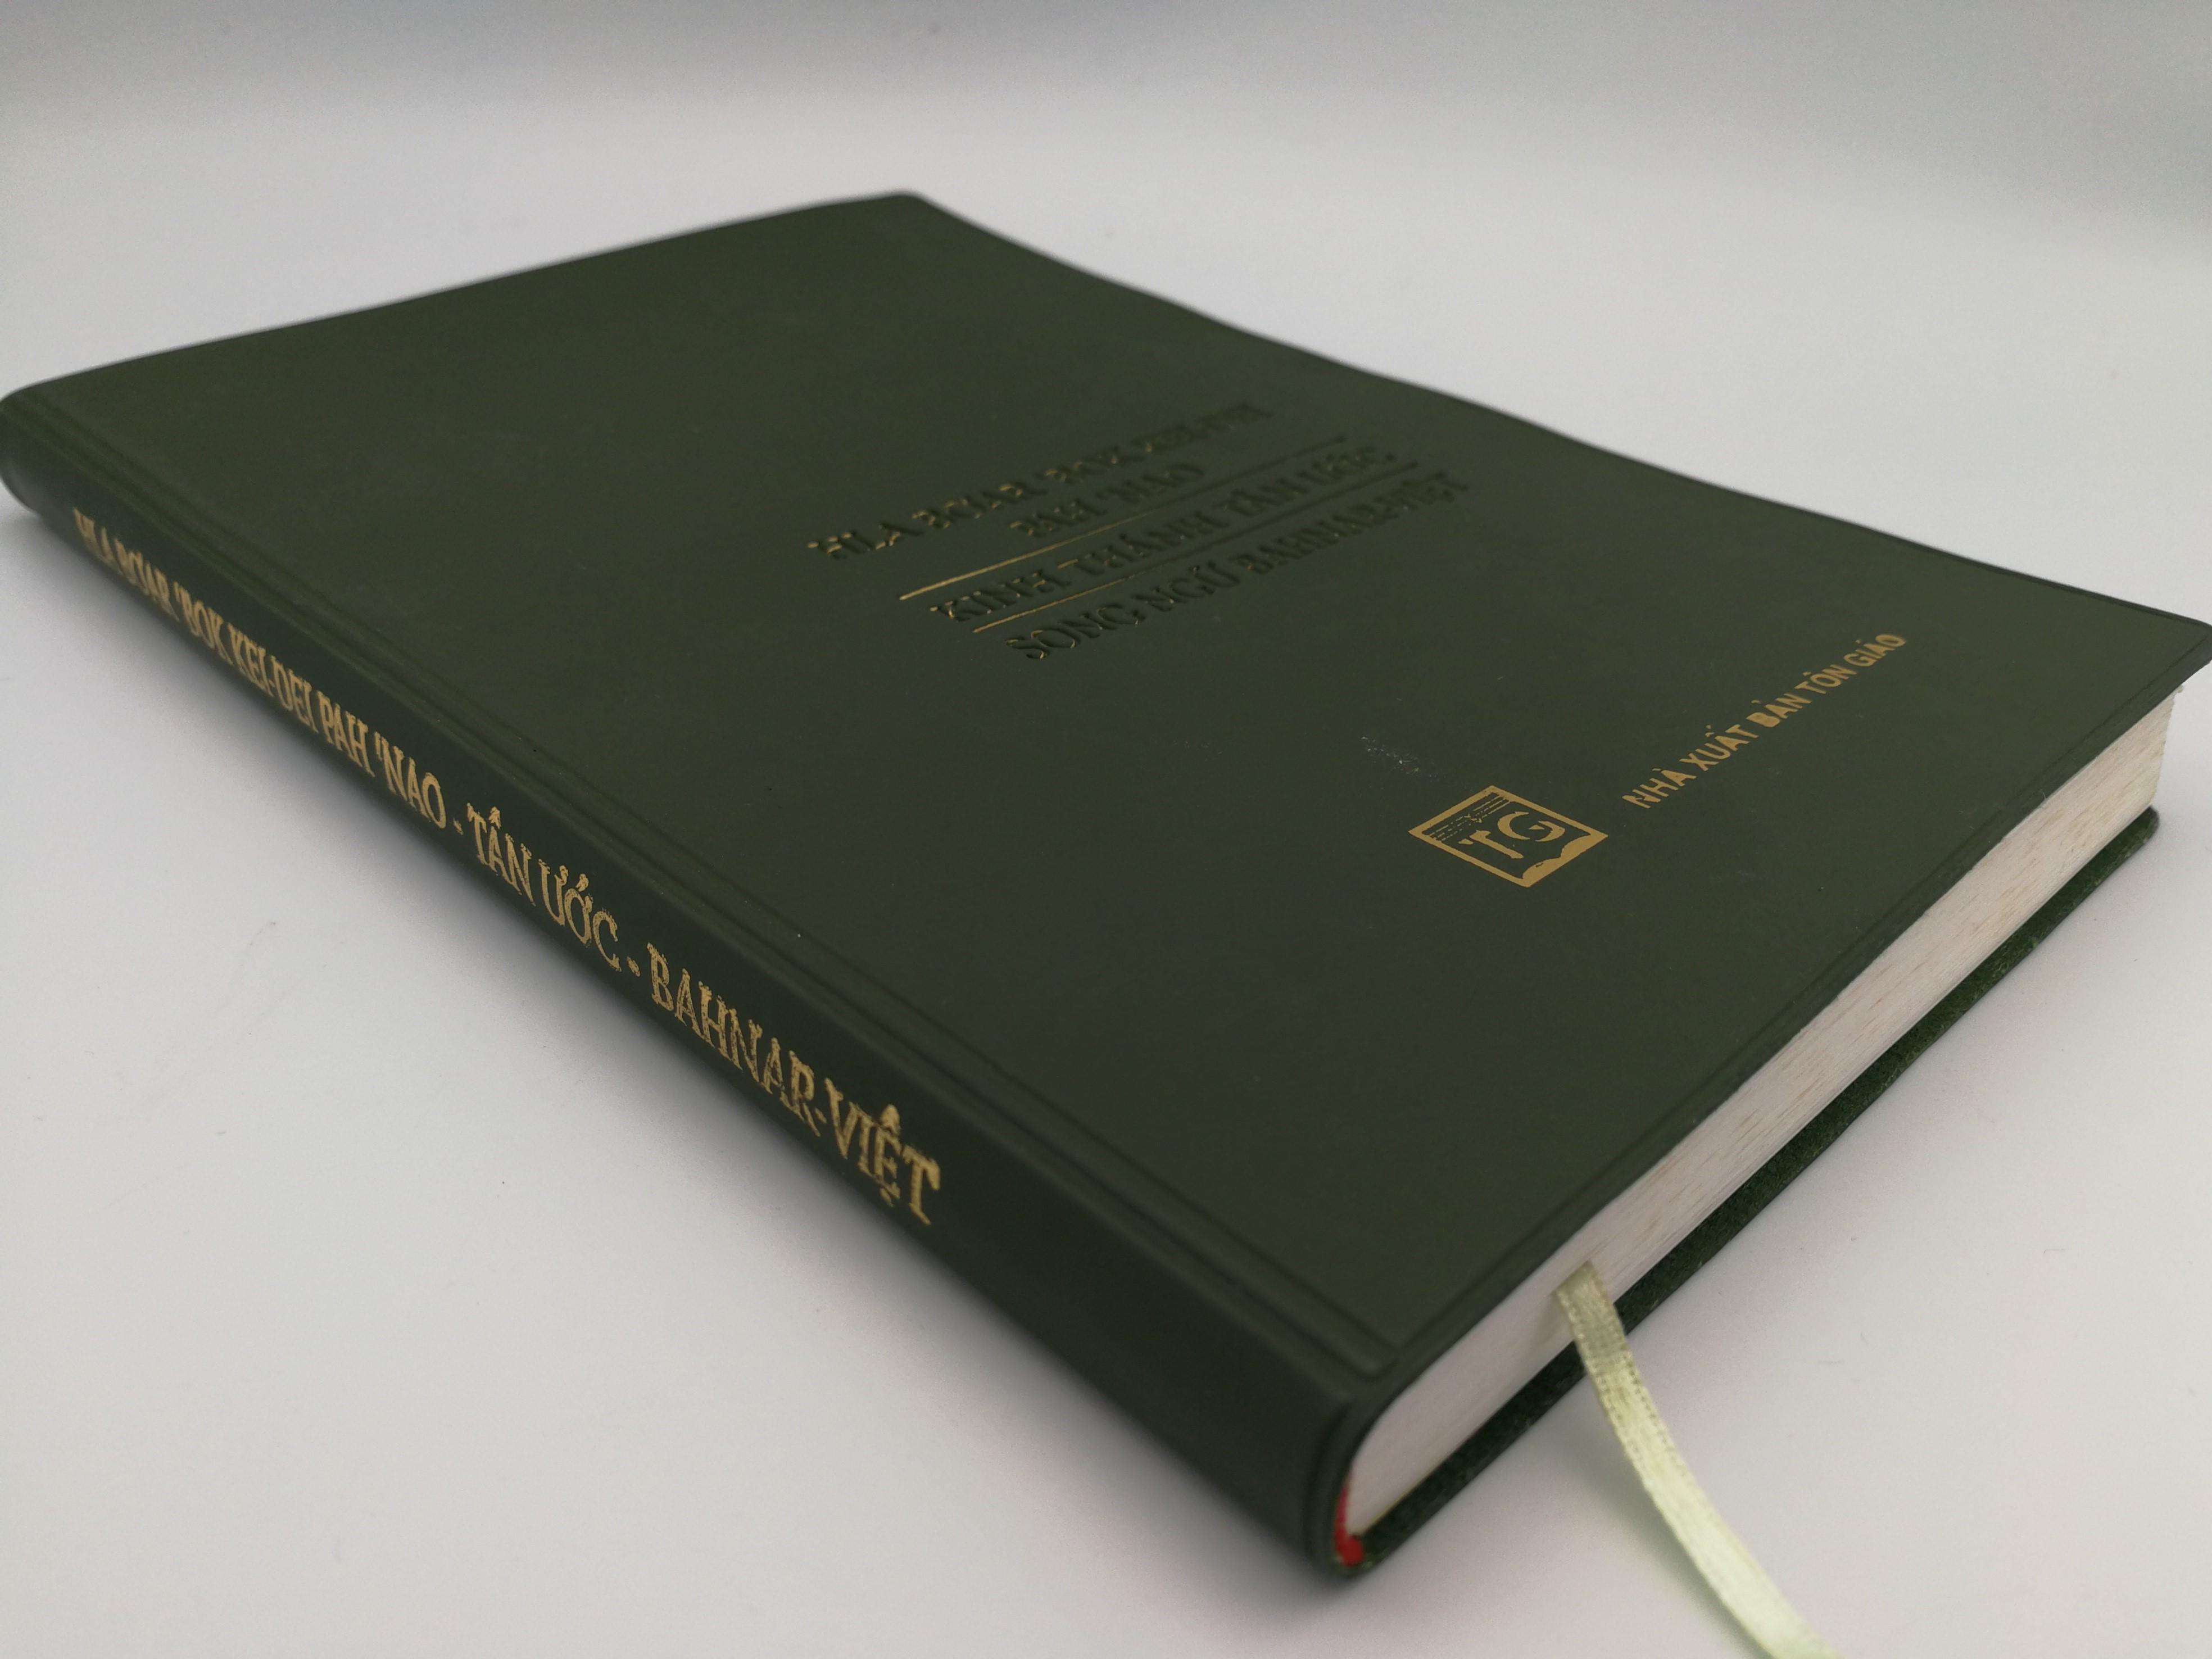 bahnar-vietnamese-bilingual-new-testament-4.jpg